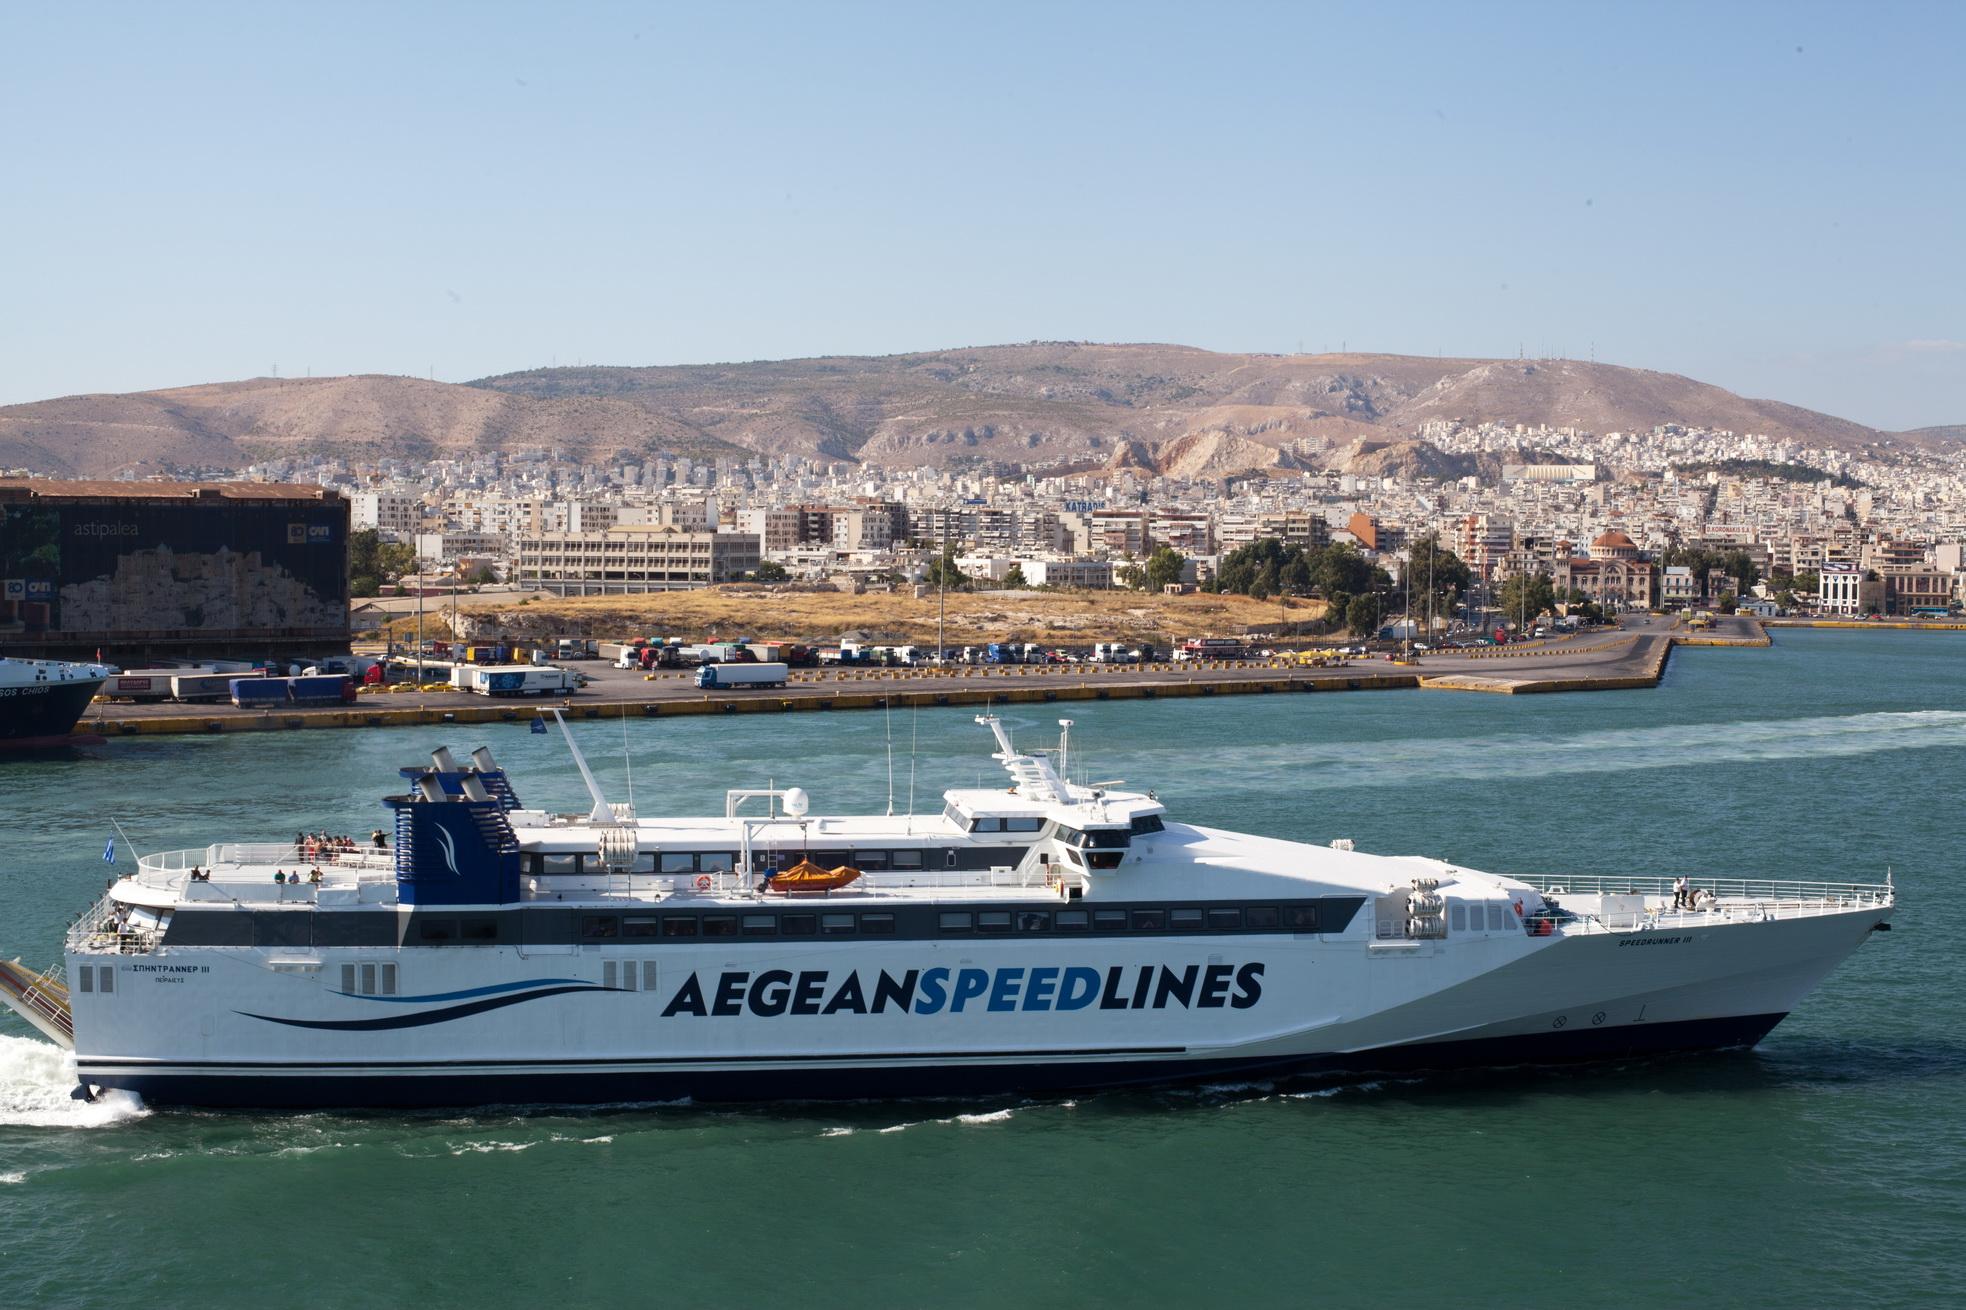 MS Speedrunner III IMO 9141871 Aegean Speed Lines entering Piraeus Port of Athens Greece 01